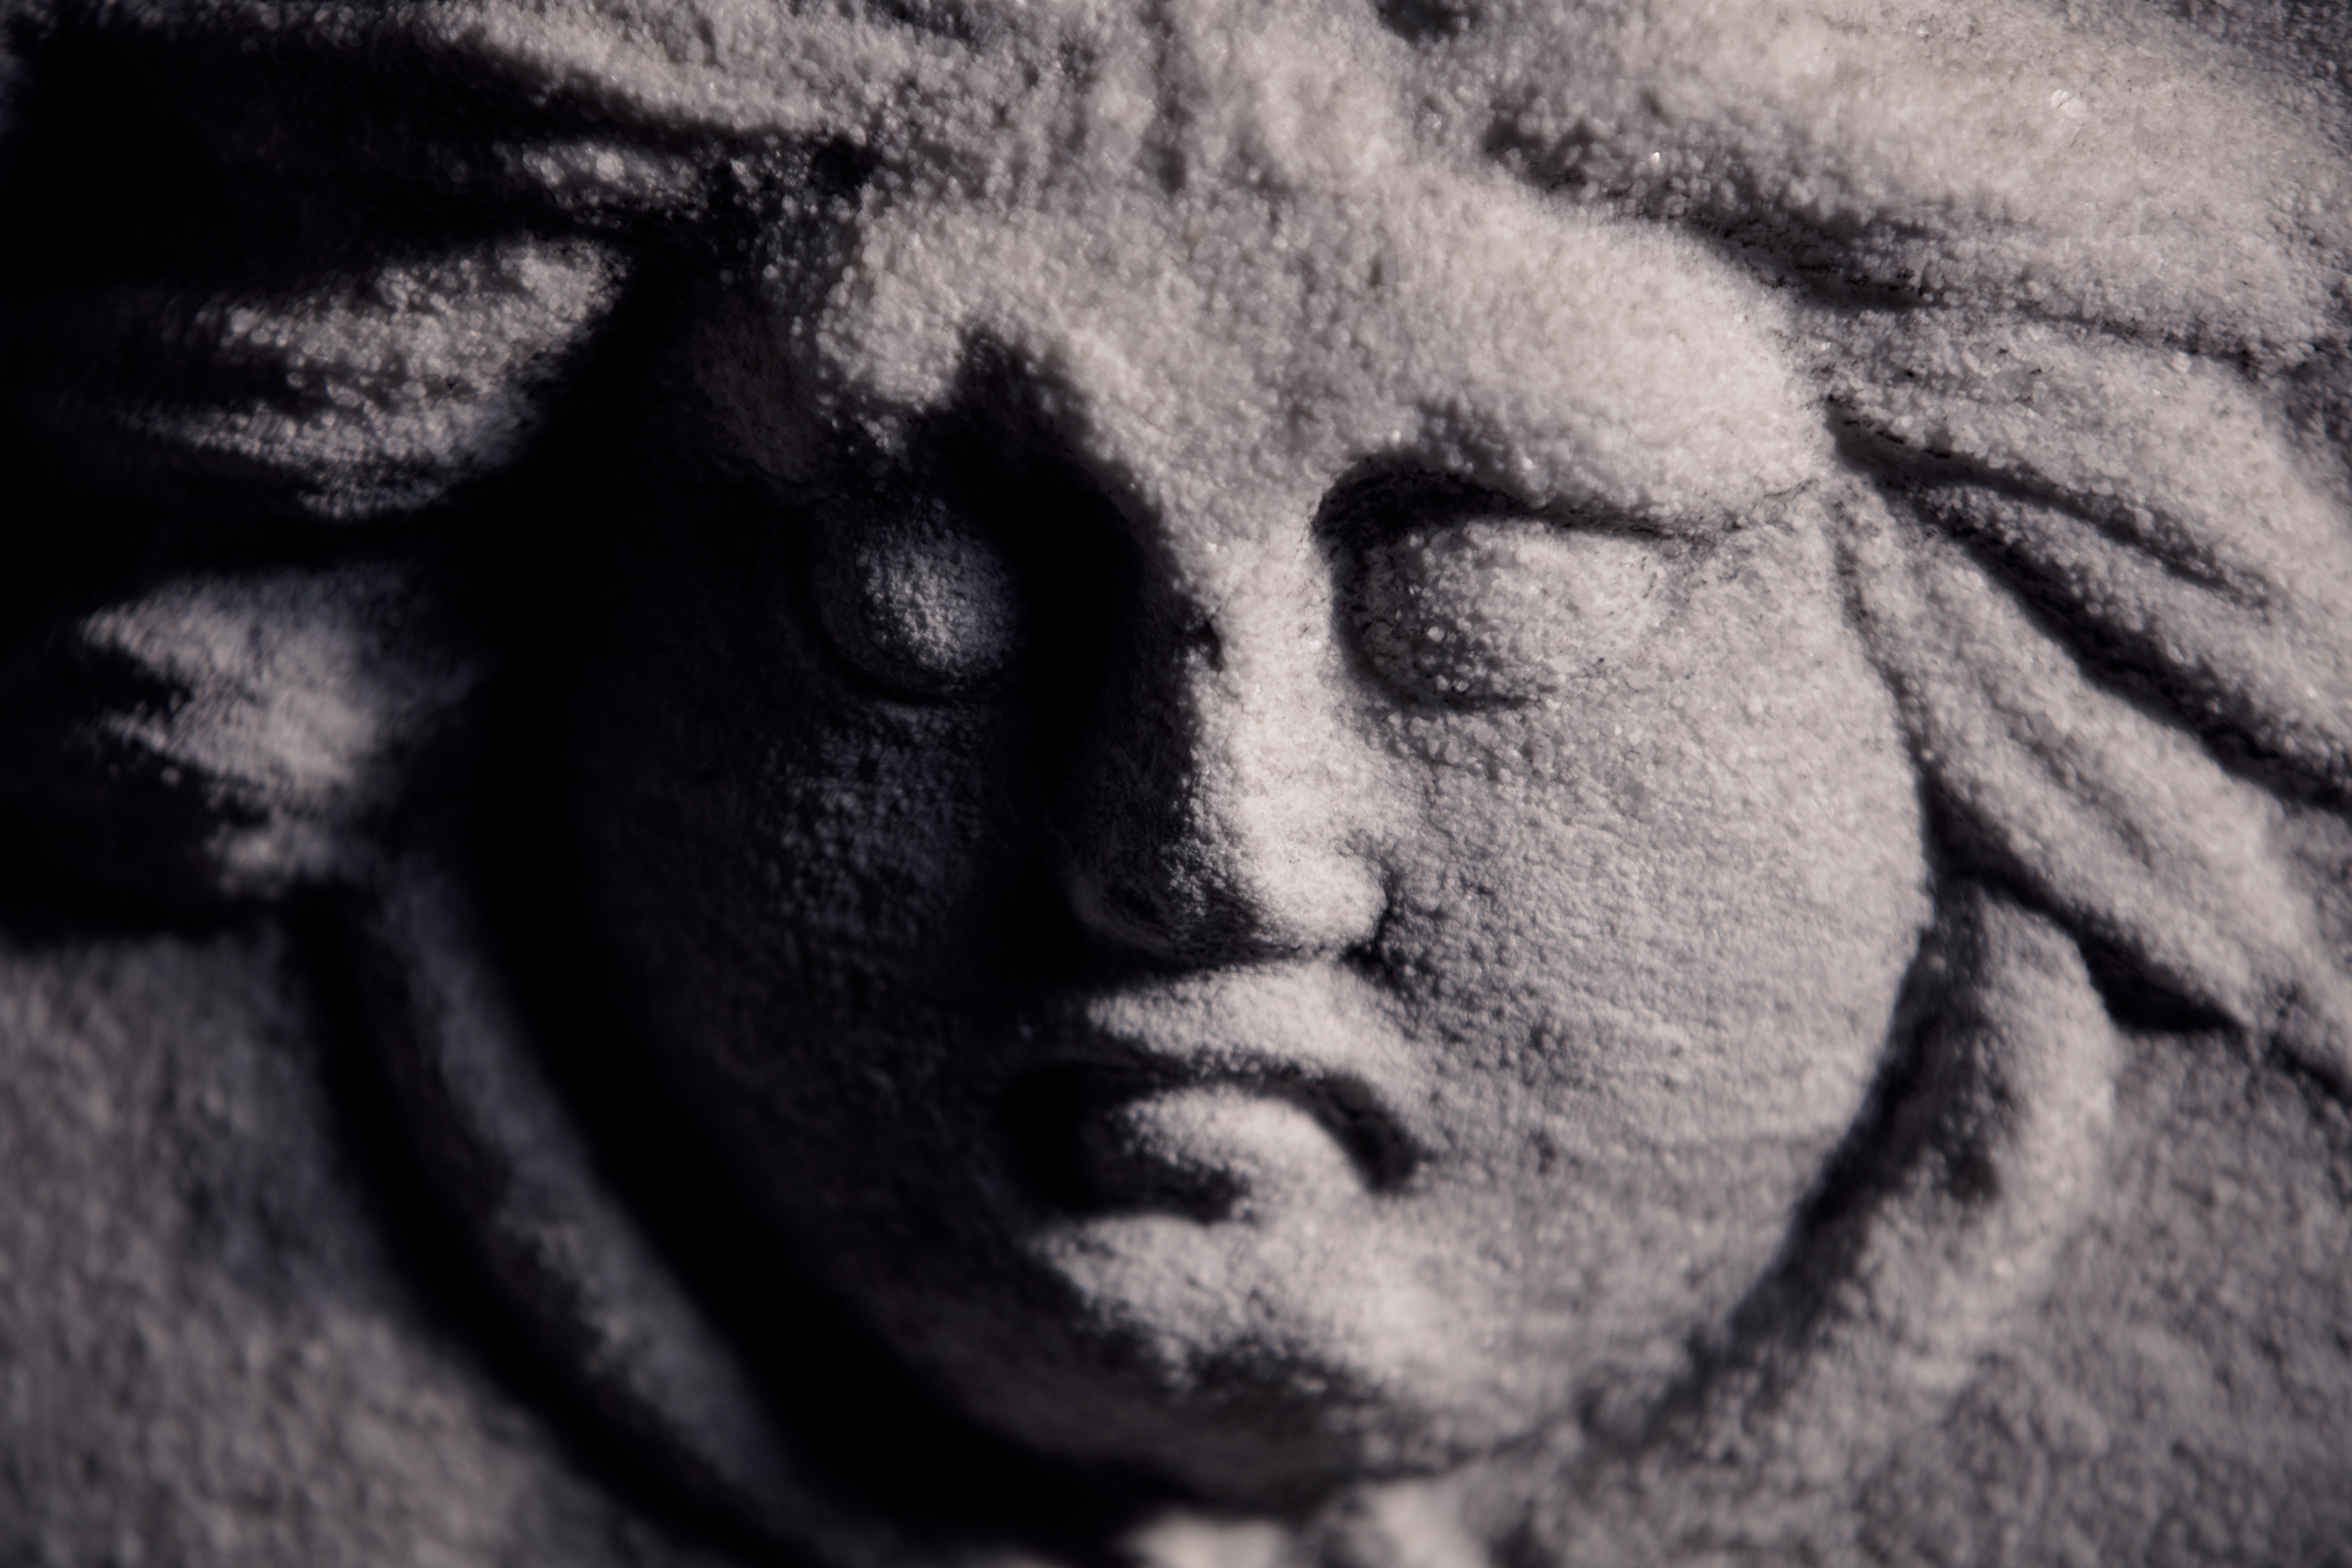 ornate marble sarcophagus